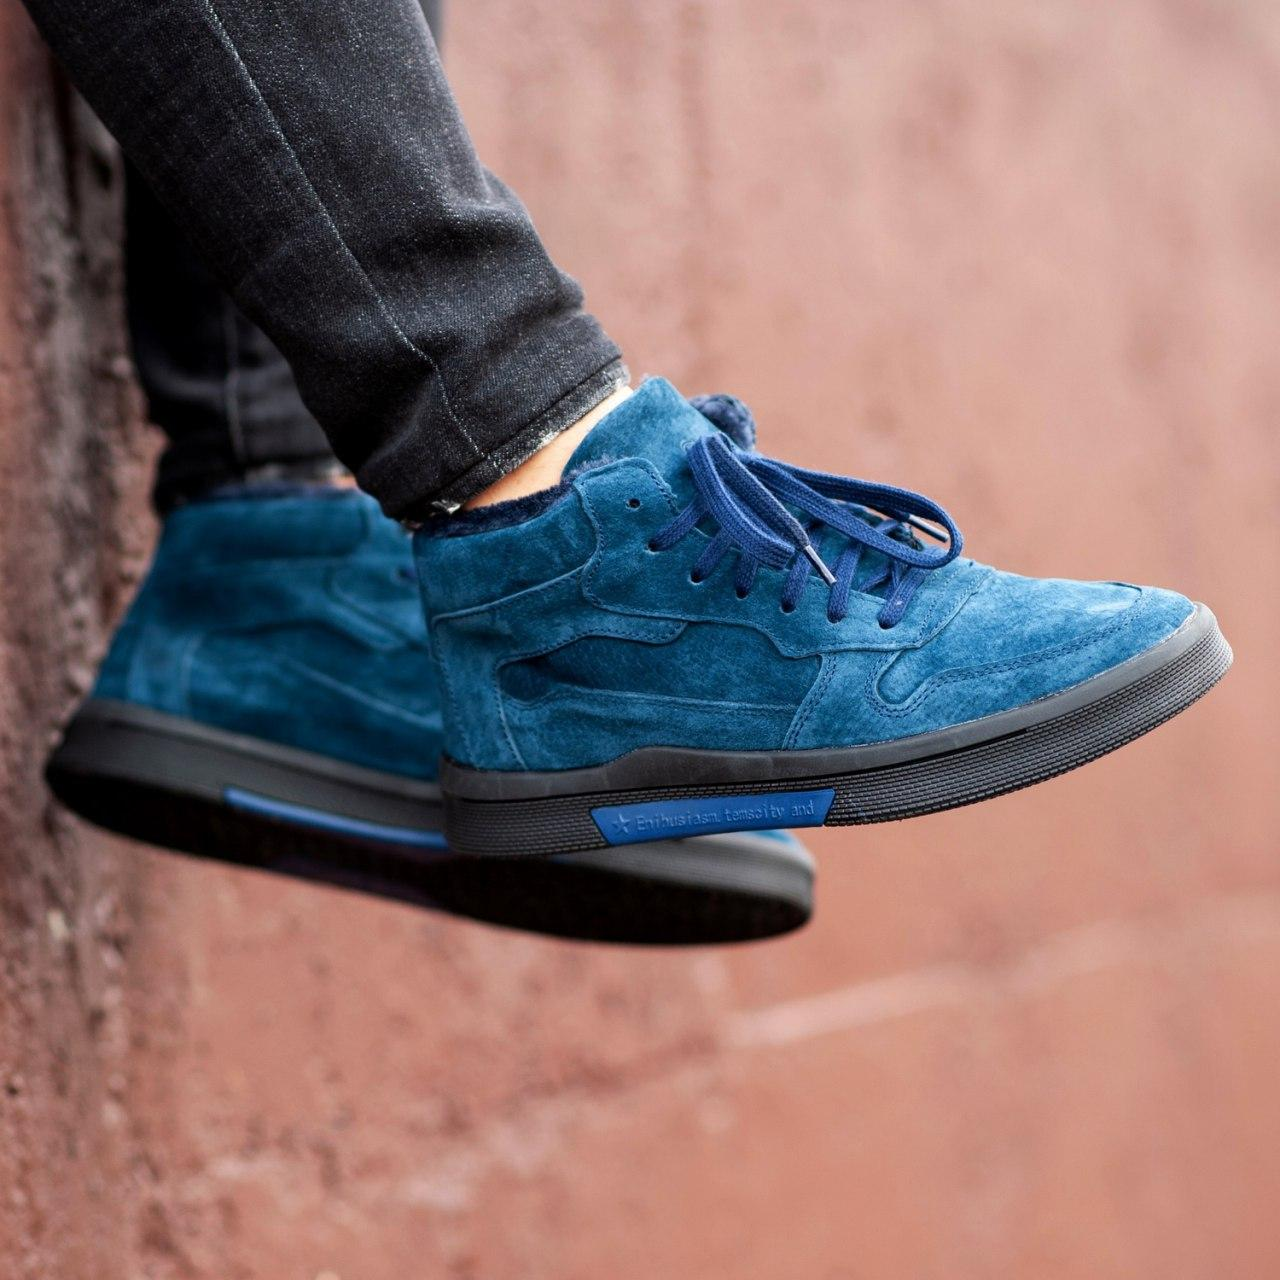 Ботинки South Oriole blue - фото 4